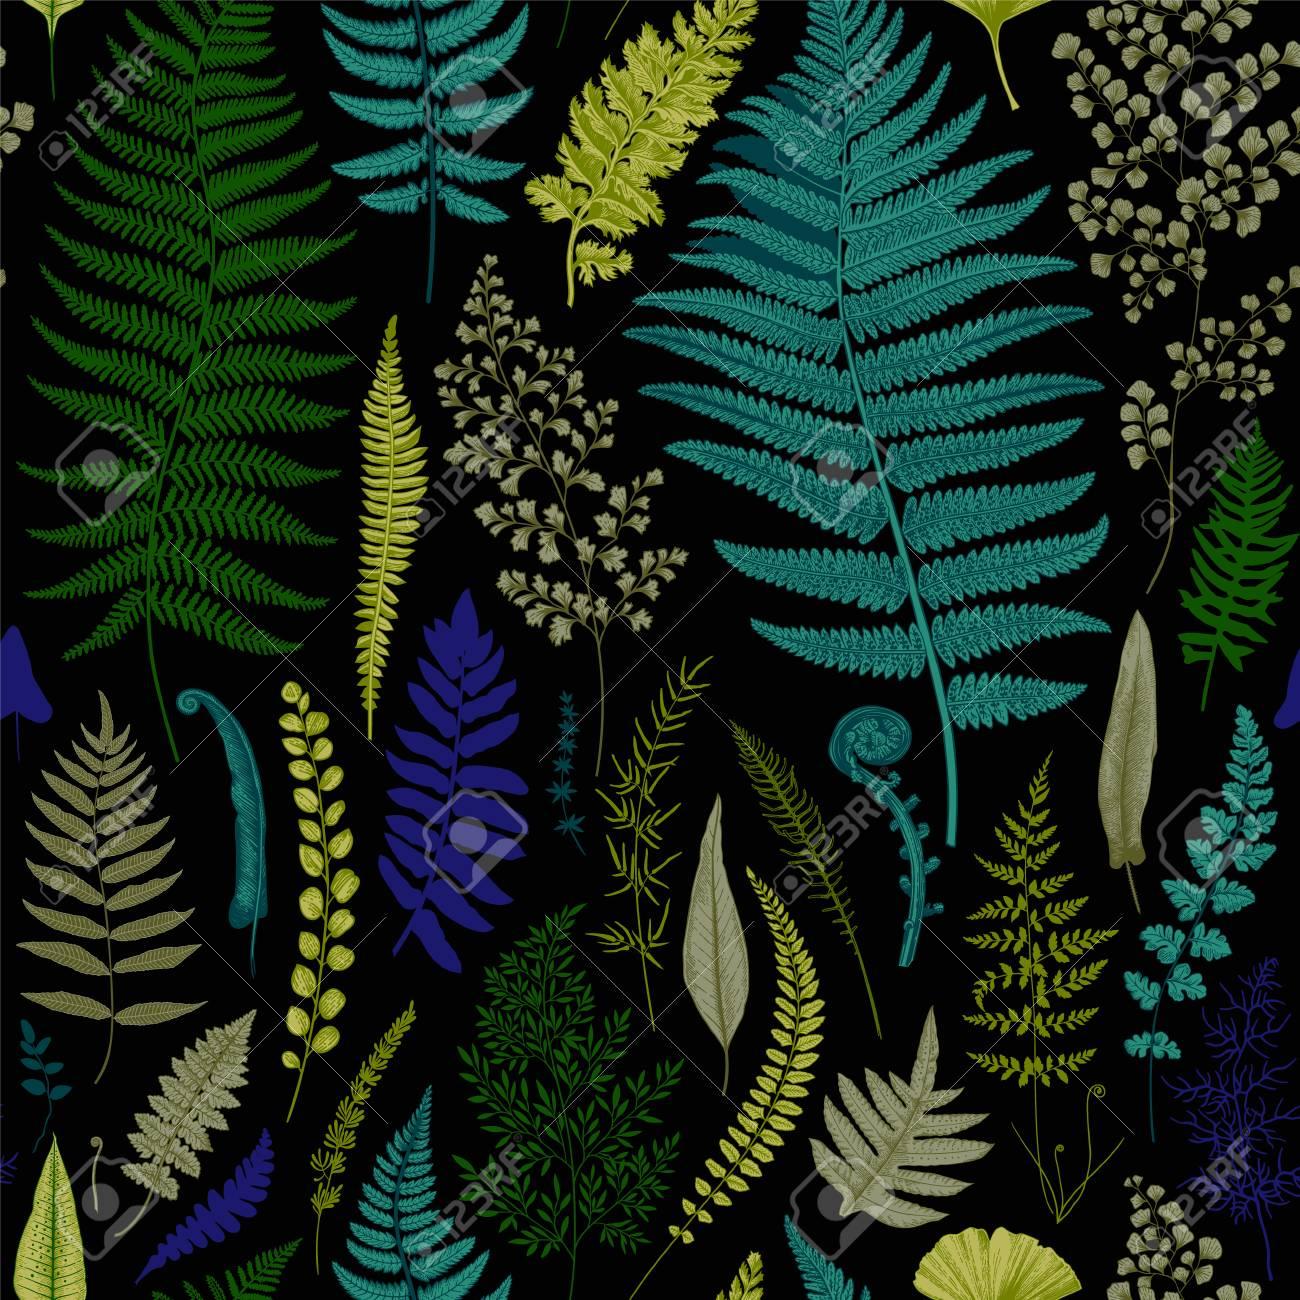 Seamless pattern. Ferns. Vintage vector botanical illustration. Vivid - 74103814